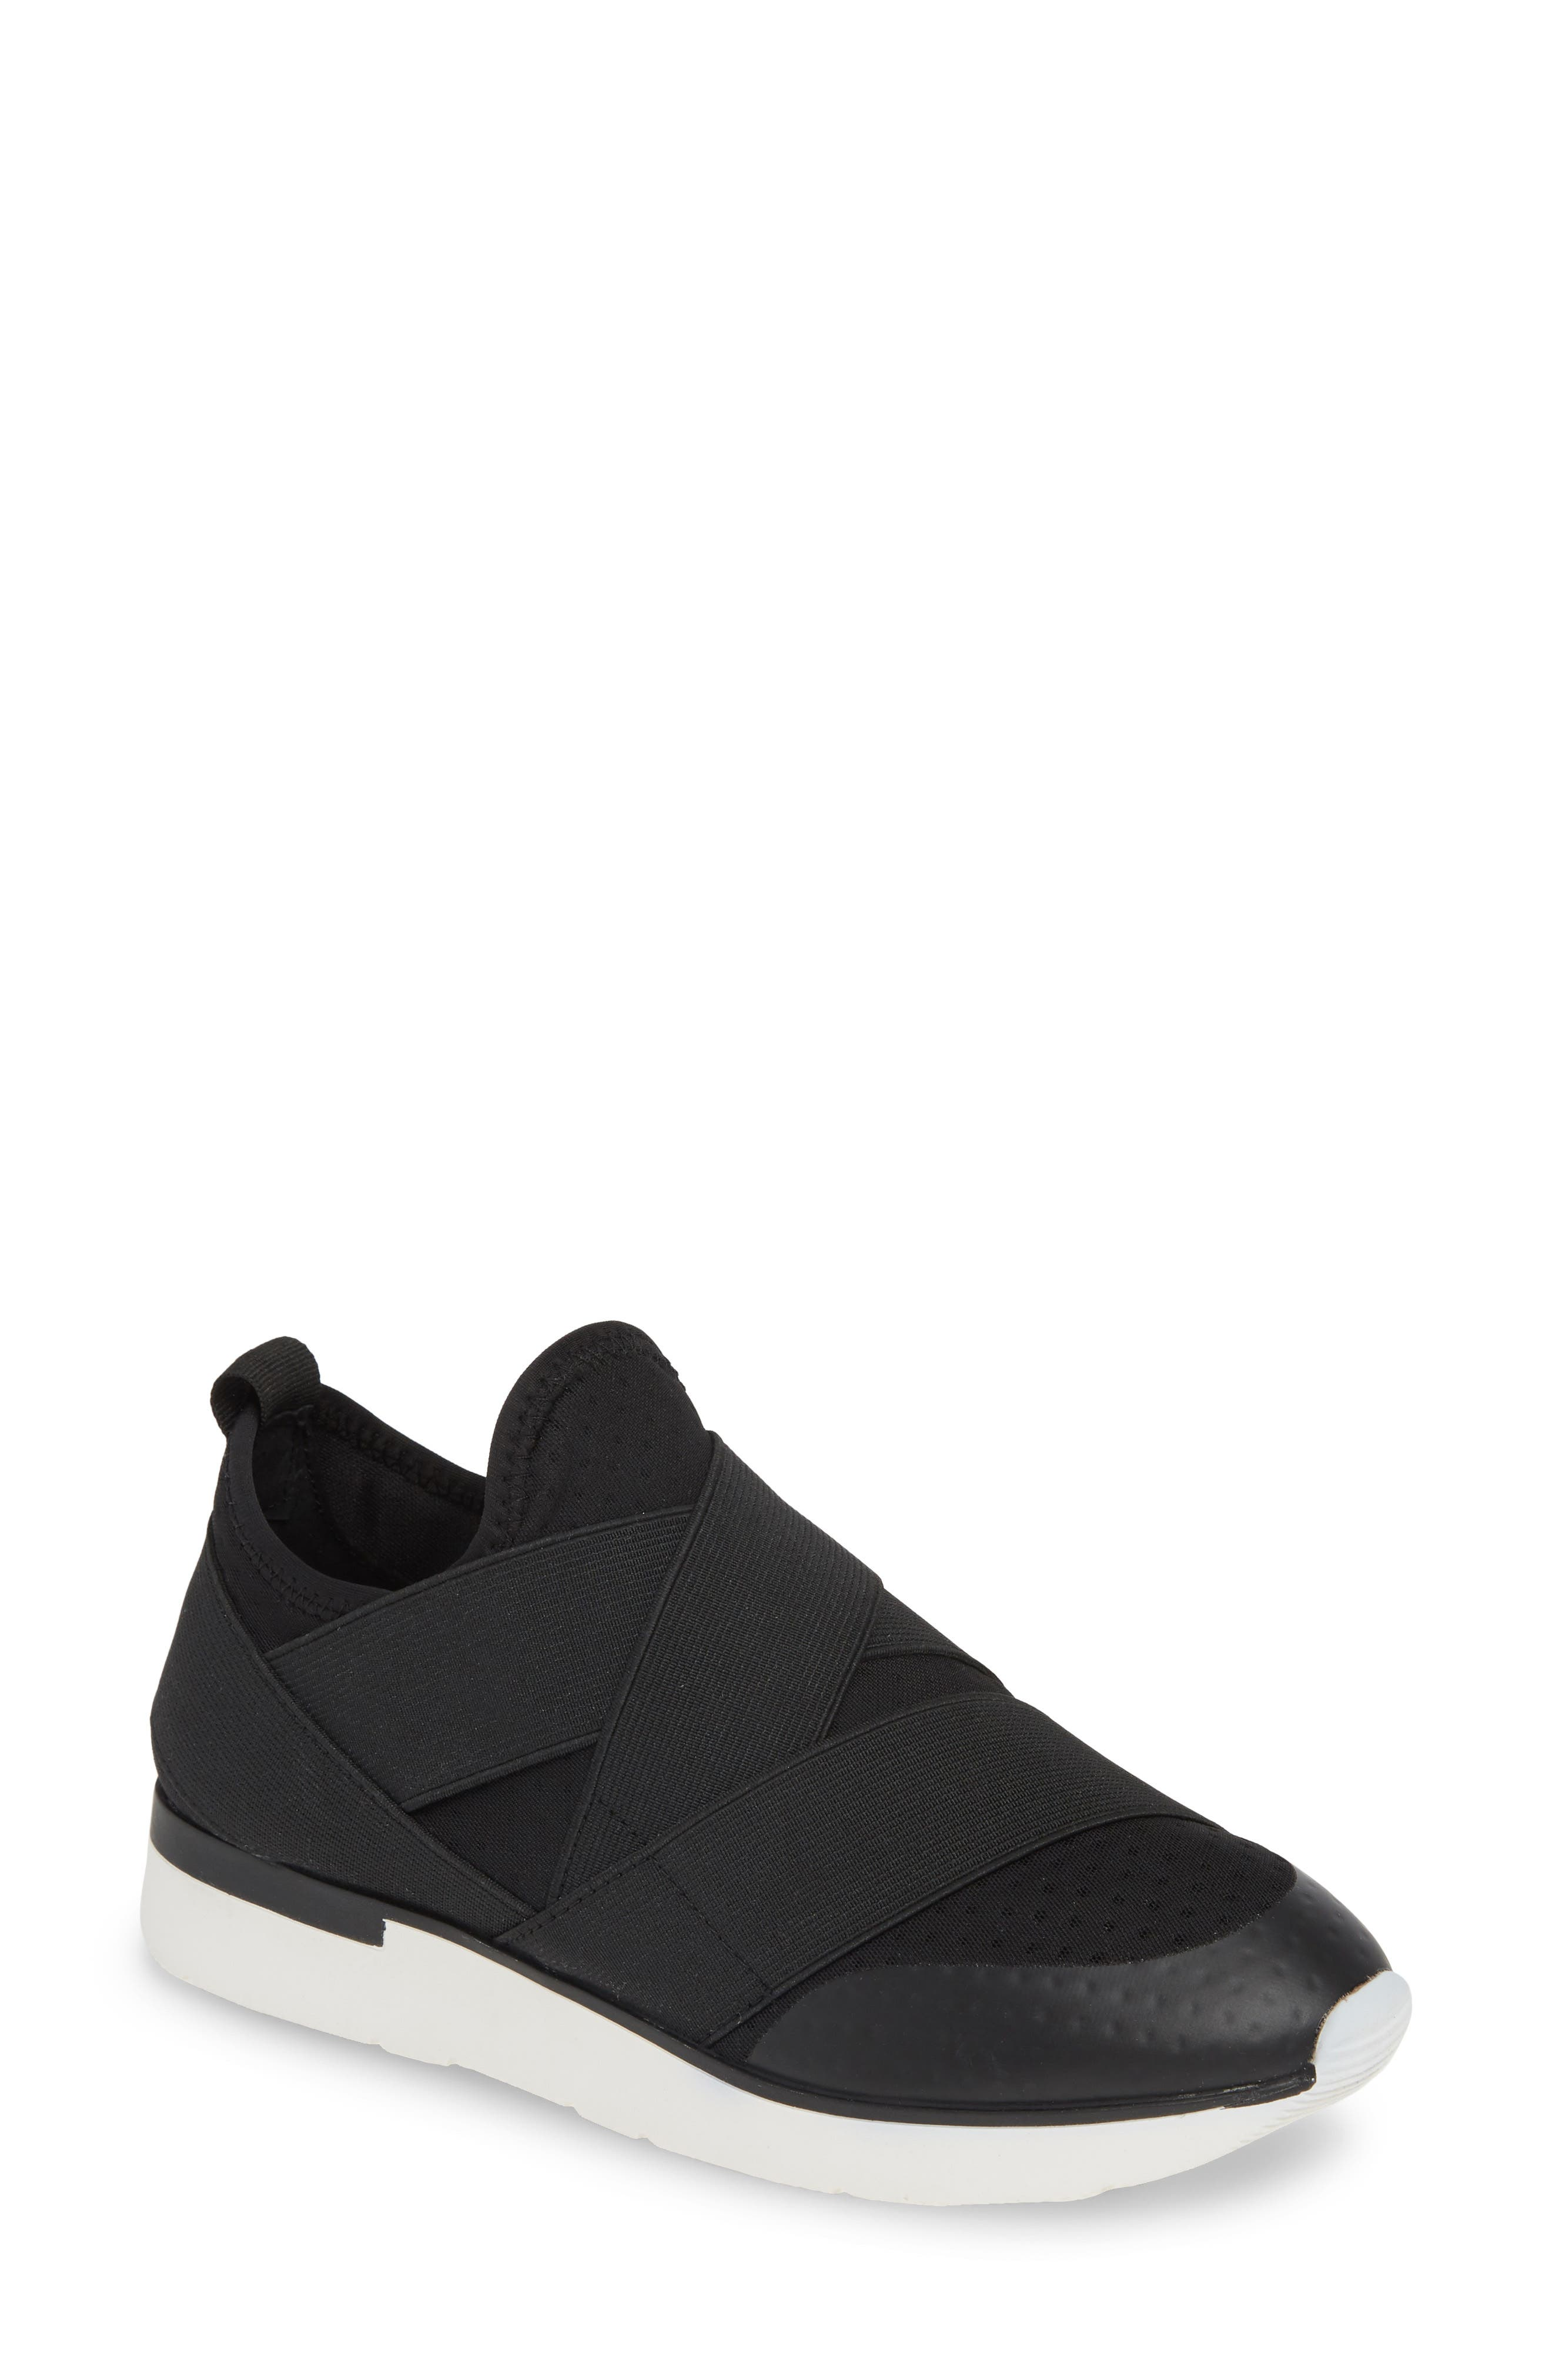 Jslides Ginny Slip-On Sneaker, Black